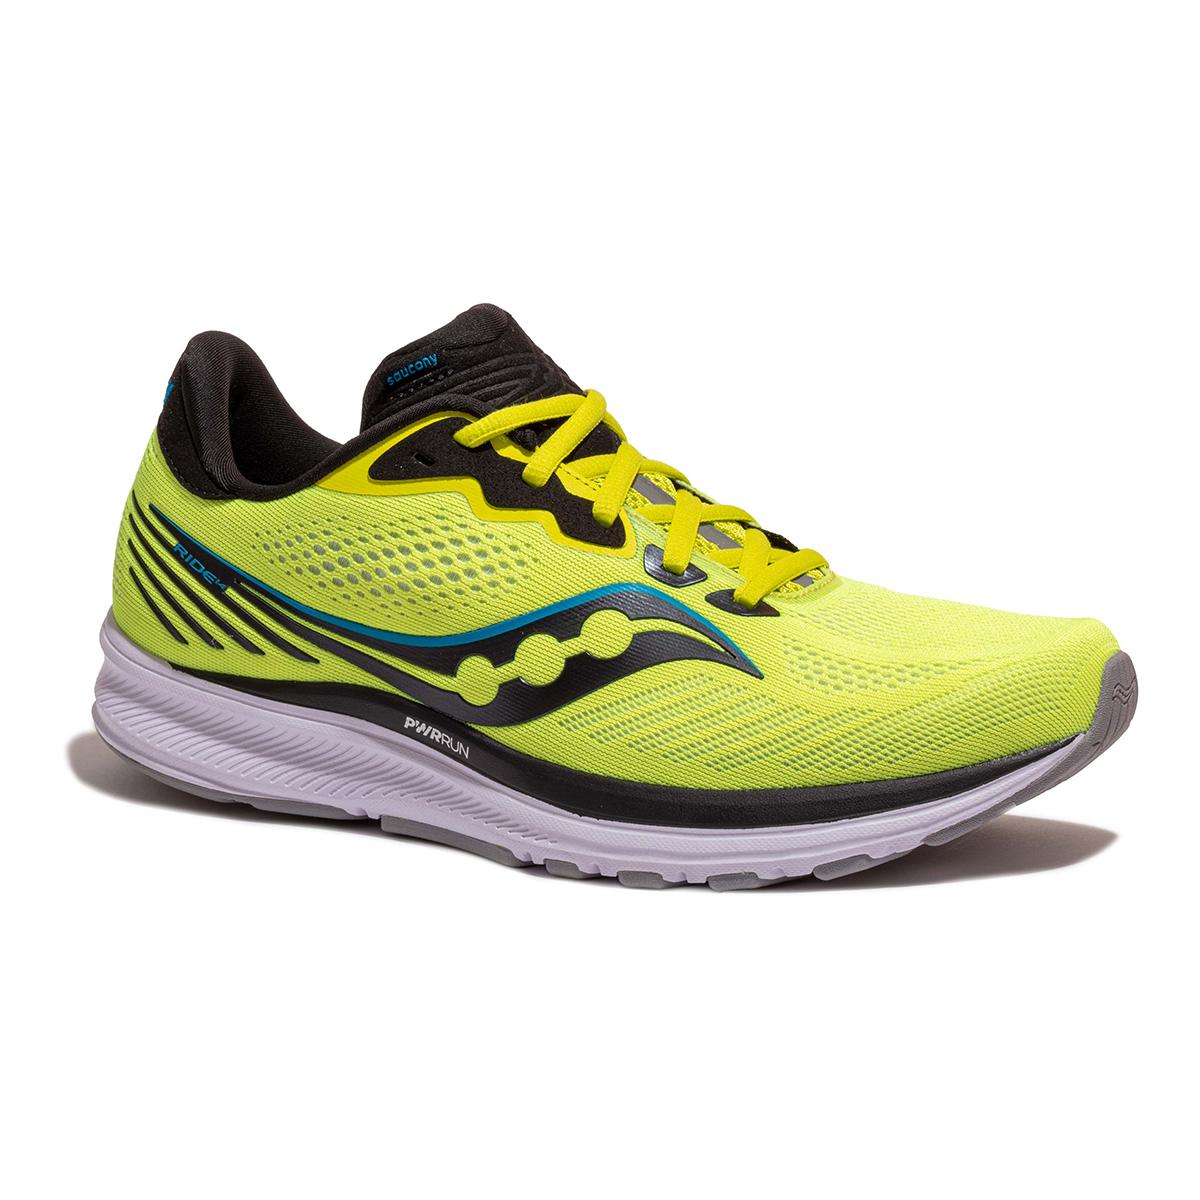 Men's Saucony Ride 14 Running Shoe - Color: Citrus / Black - Size: 7 - Width: Regular, Citrus / Black, large, image 3